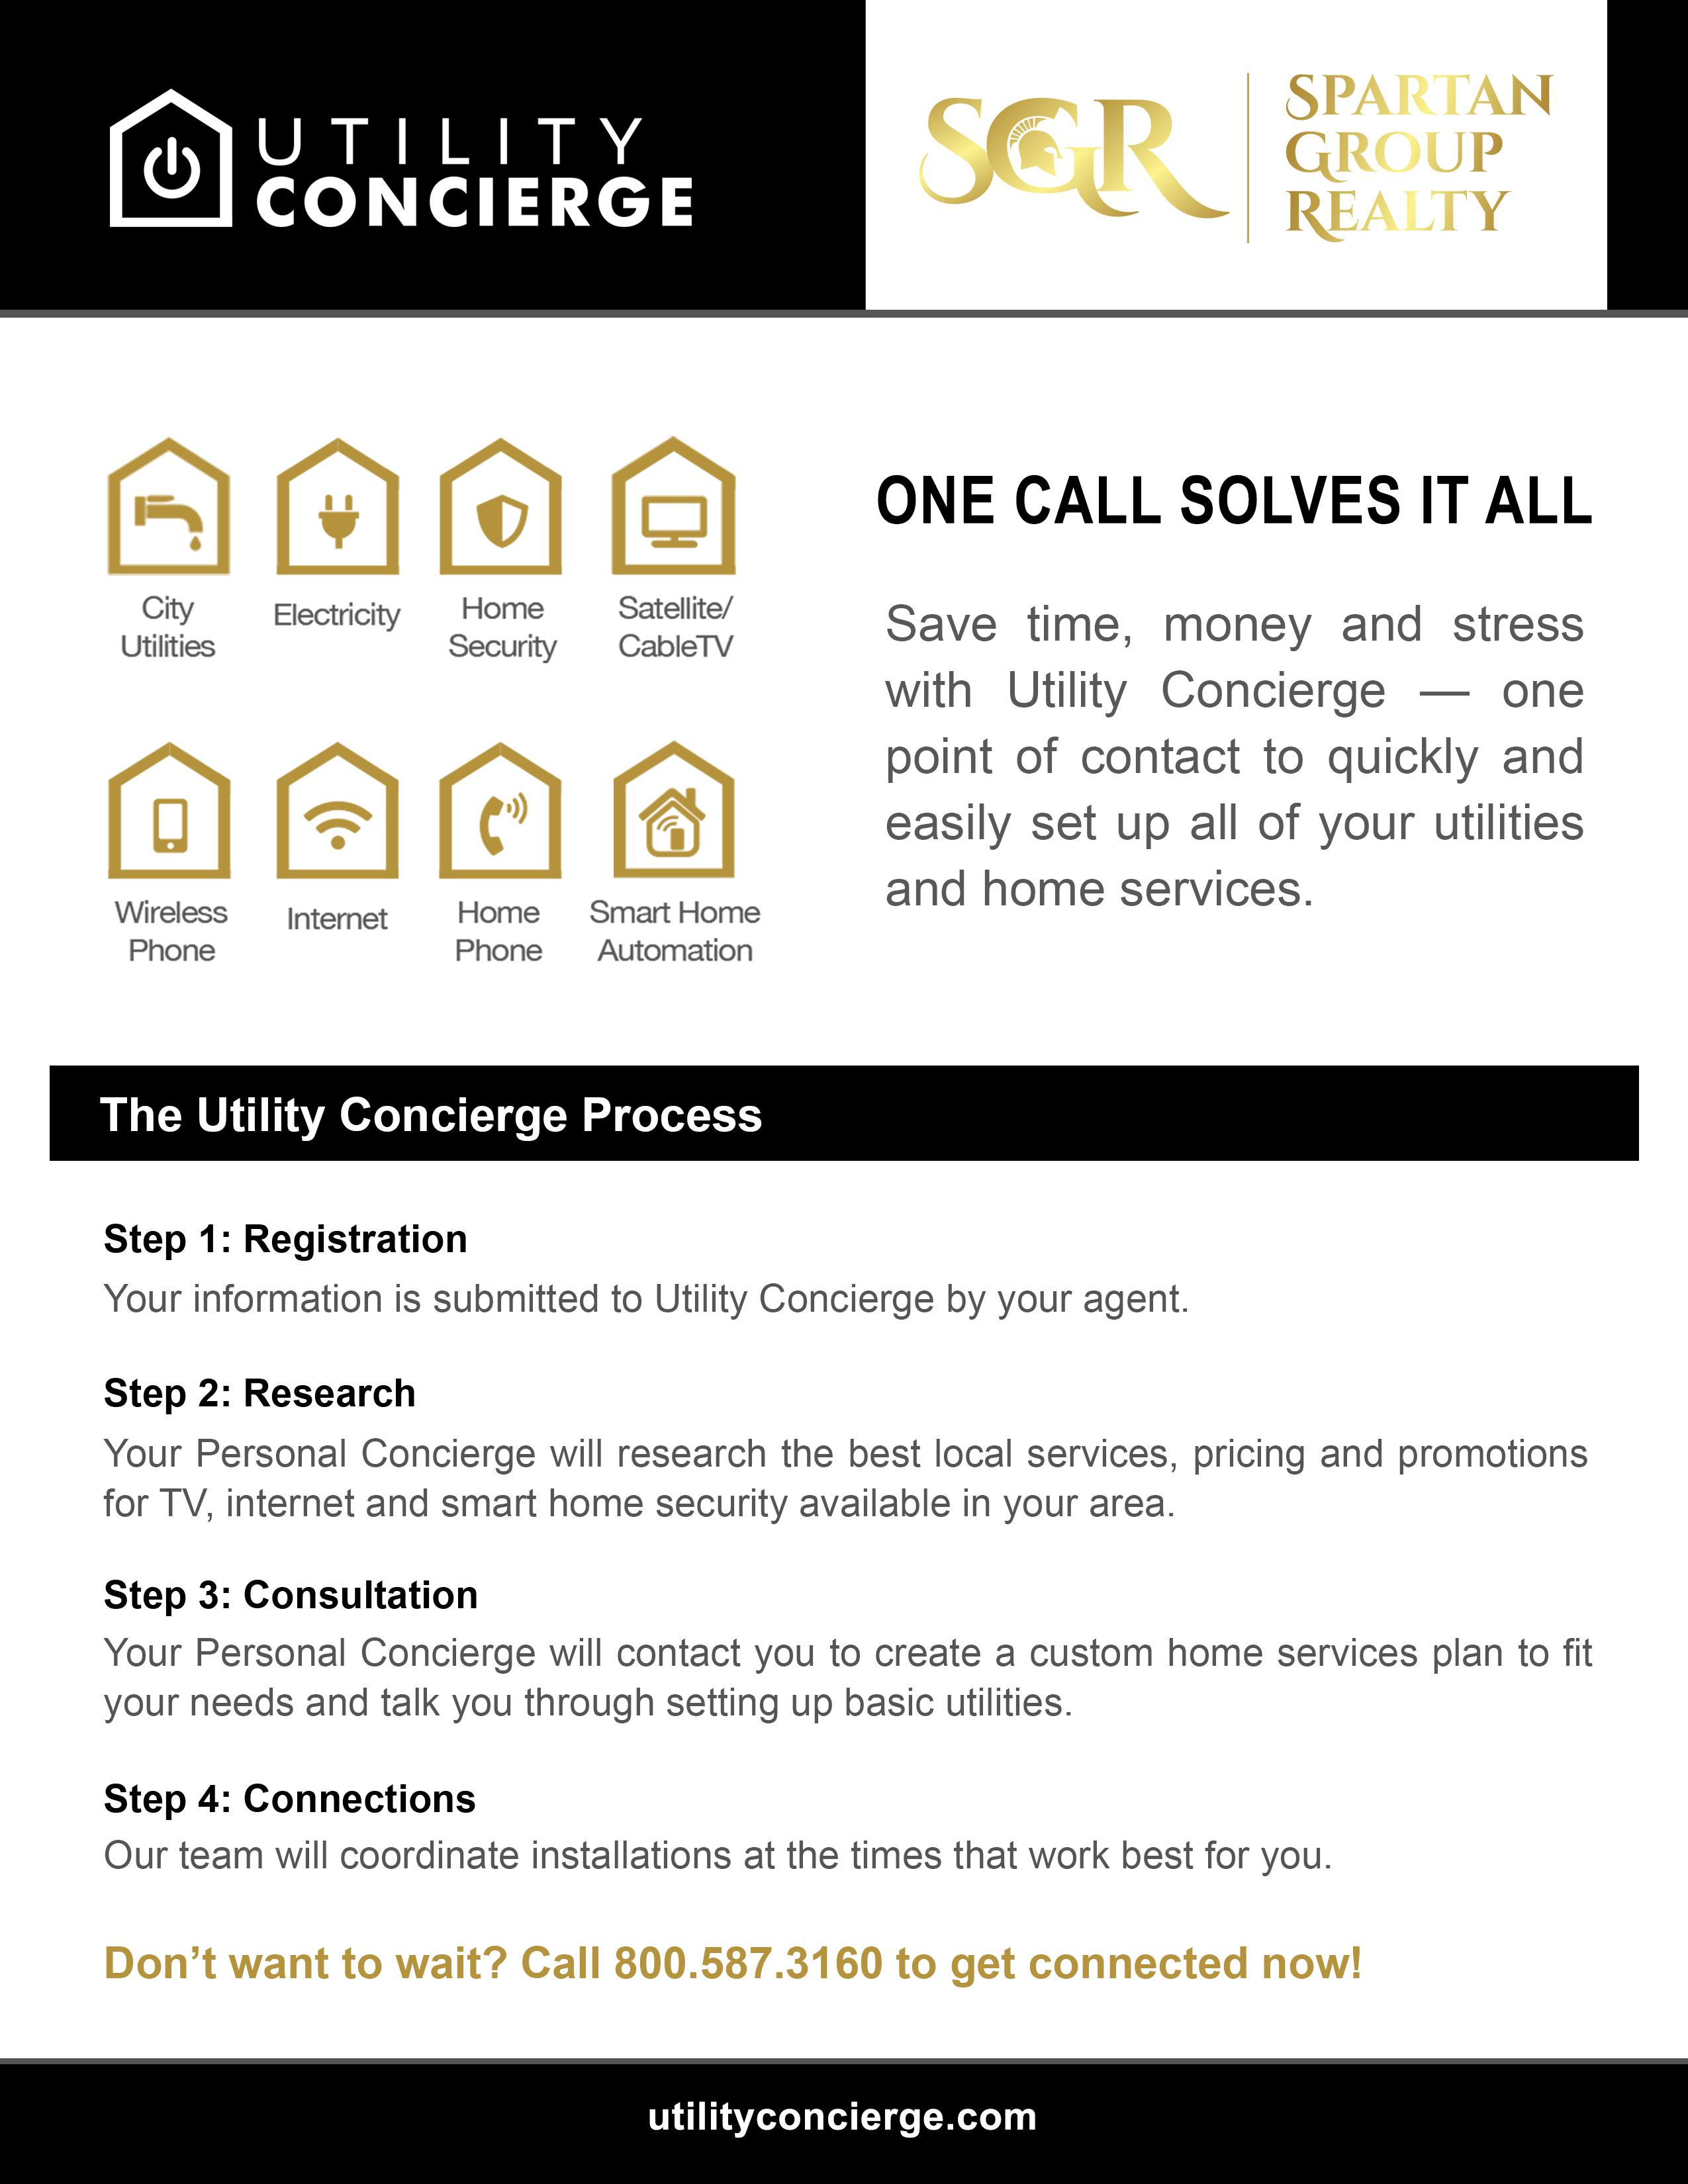 utility concierge